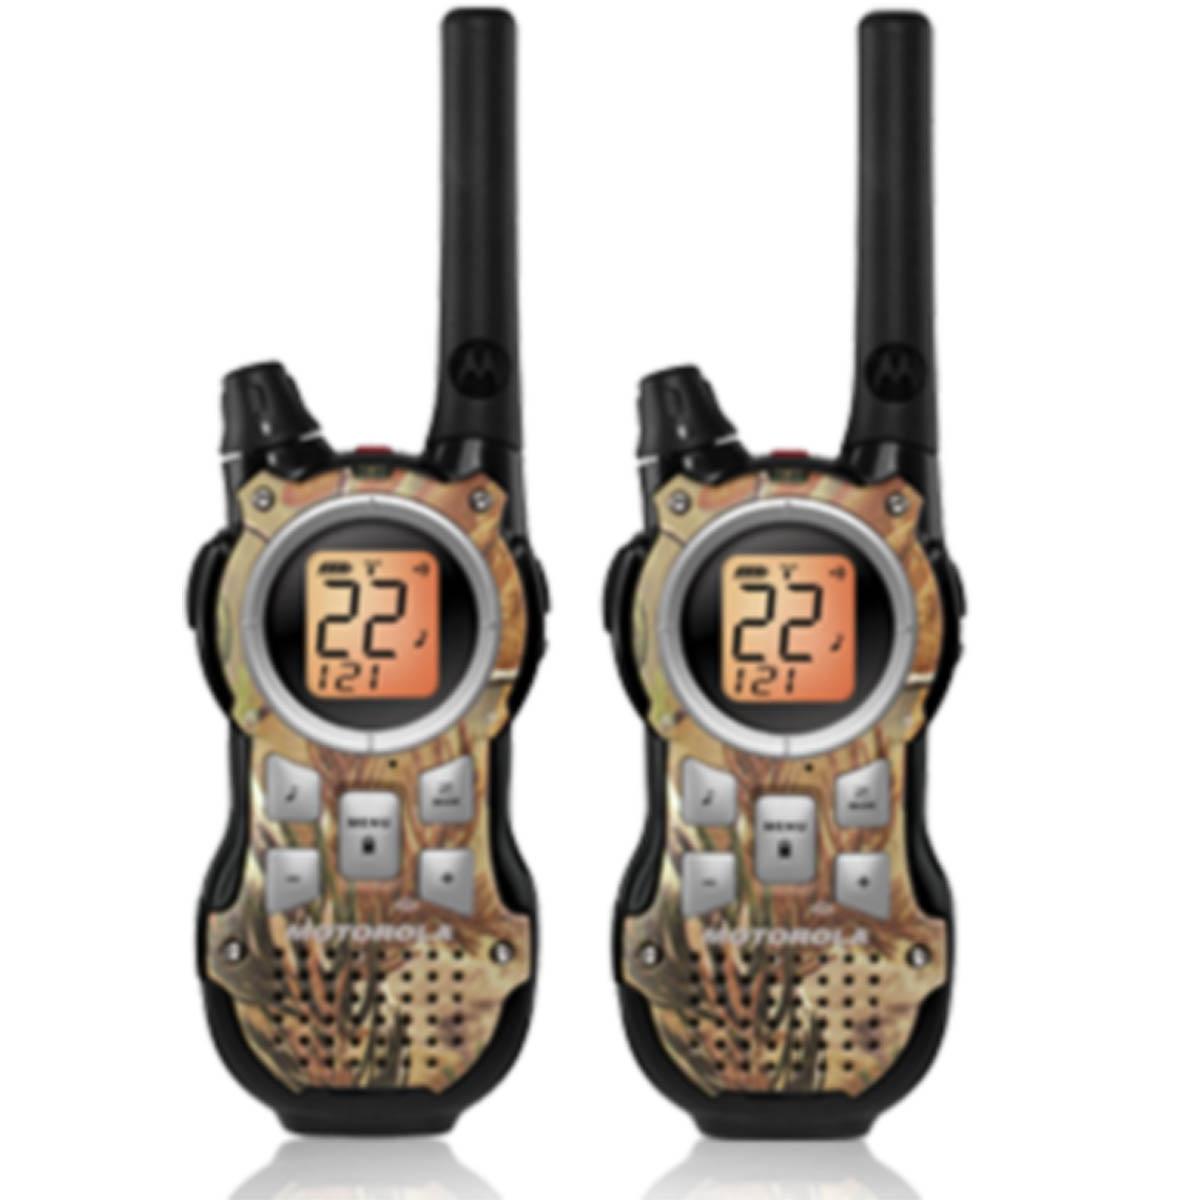 motorola talkabout mr355r walkie talkie. Black Bedroom Furniture Sets. Home Design Ideas